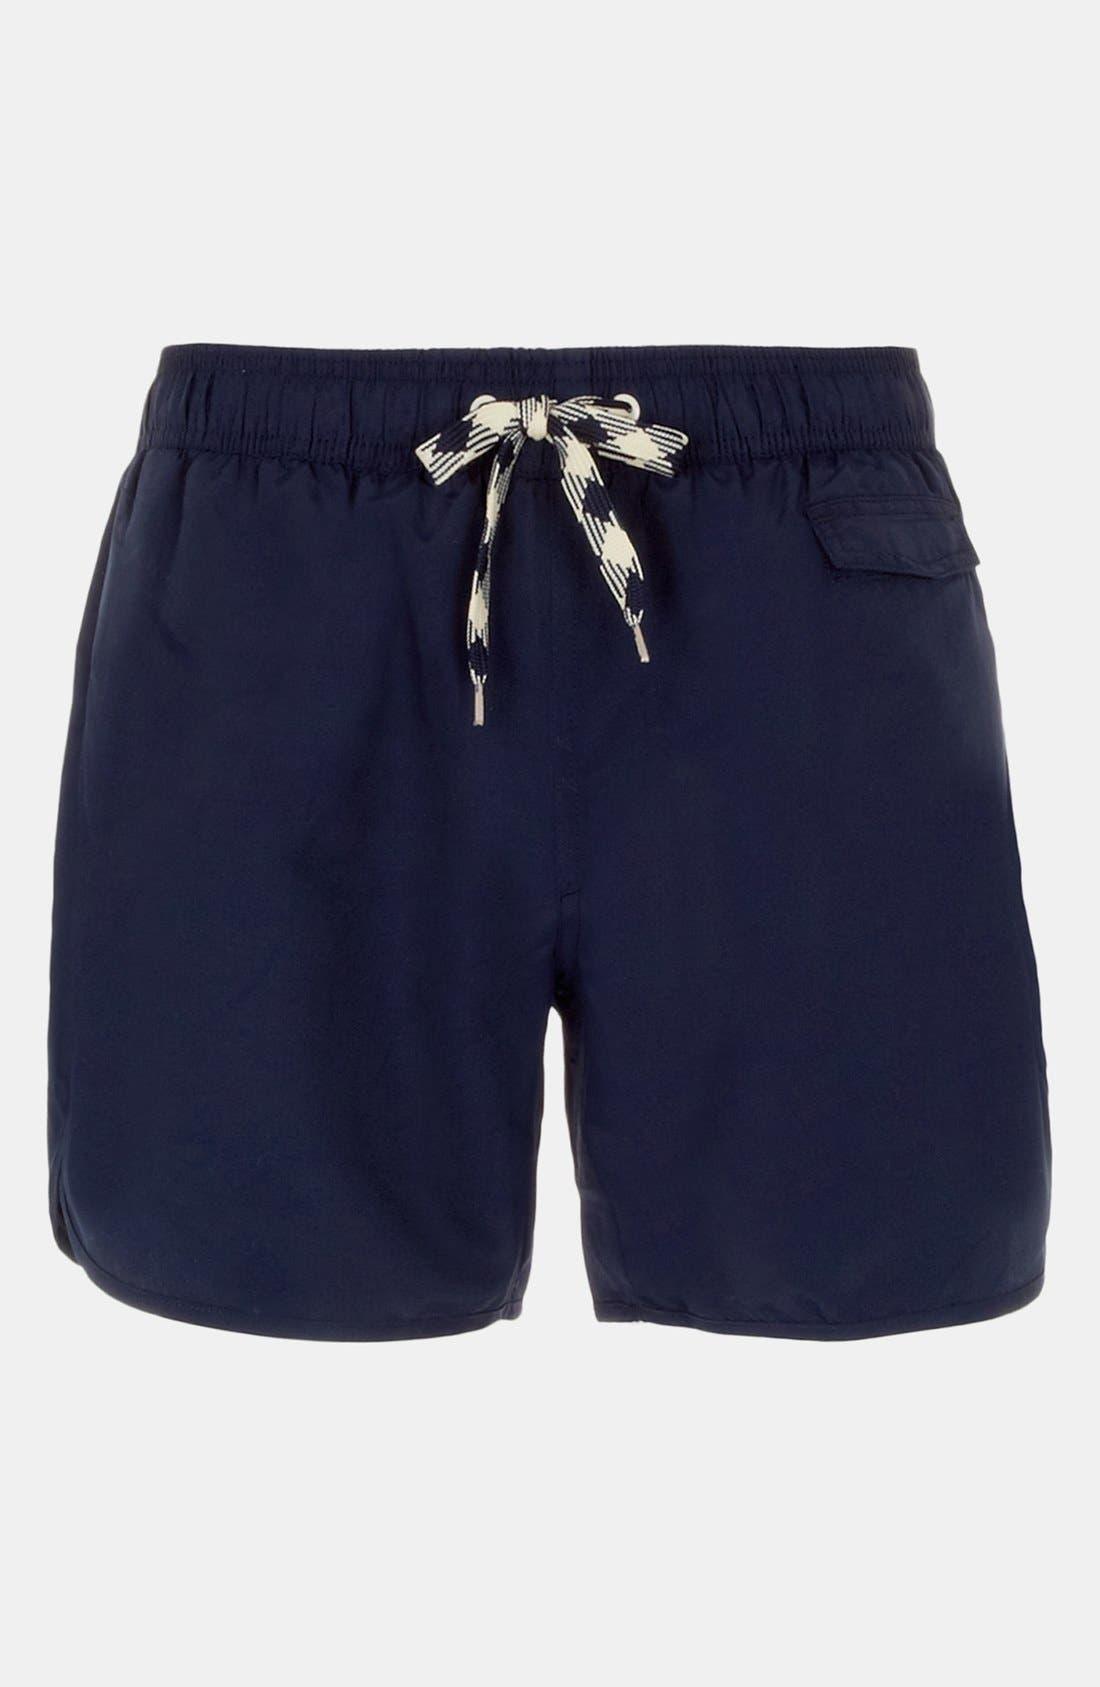 Alternate Image 1 Selected - Topman 'Cornwall' Swim Trunks